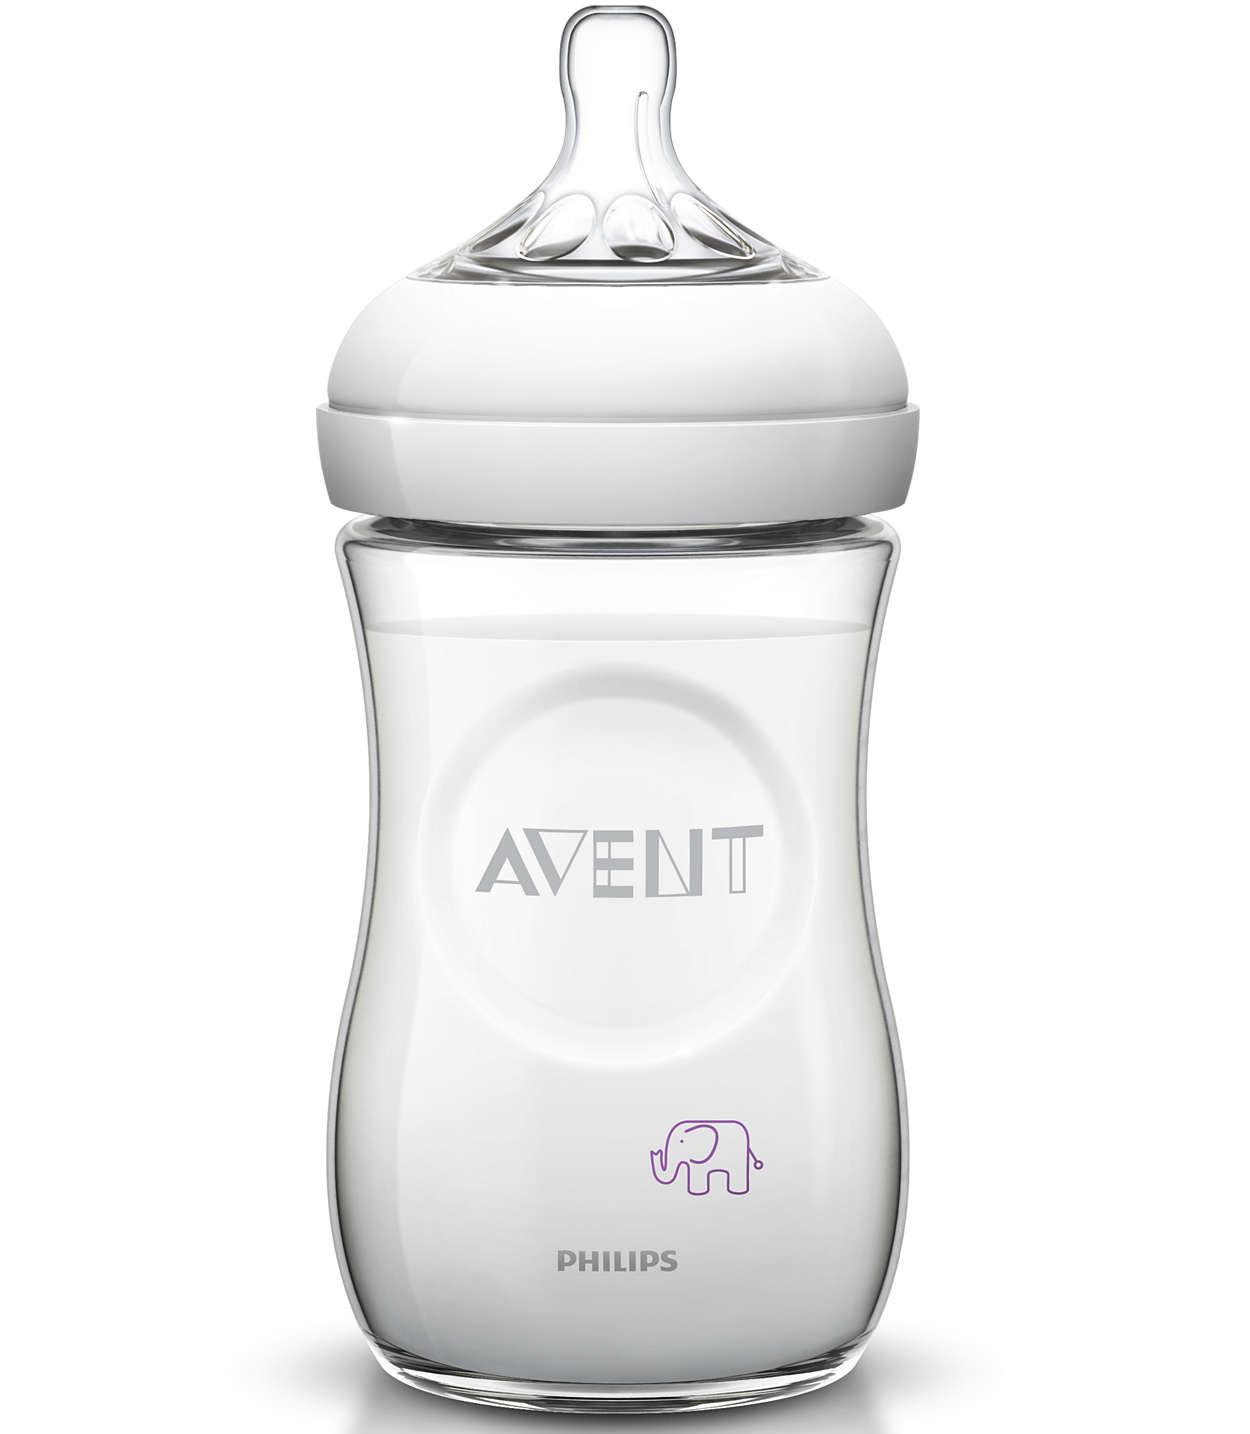 Avent Natural Μπιμπερό Πλαστικό Χωρίς BPA Σχέδιο Μώβ 1m+ 260ml SCF628/17